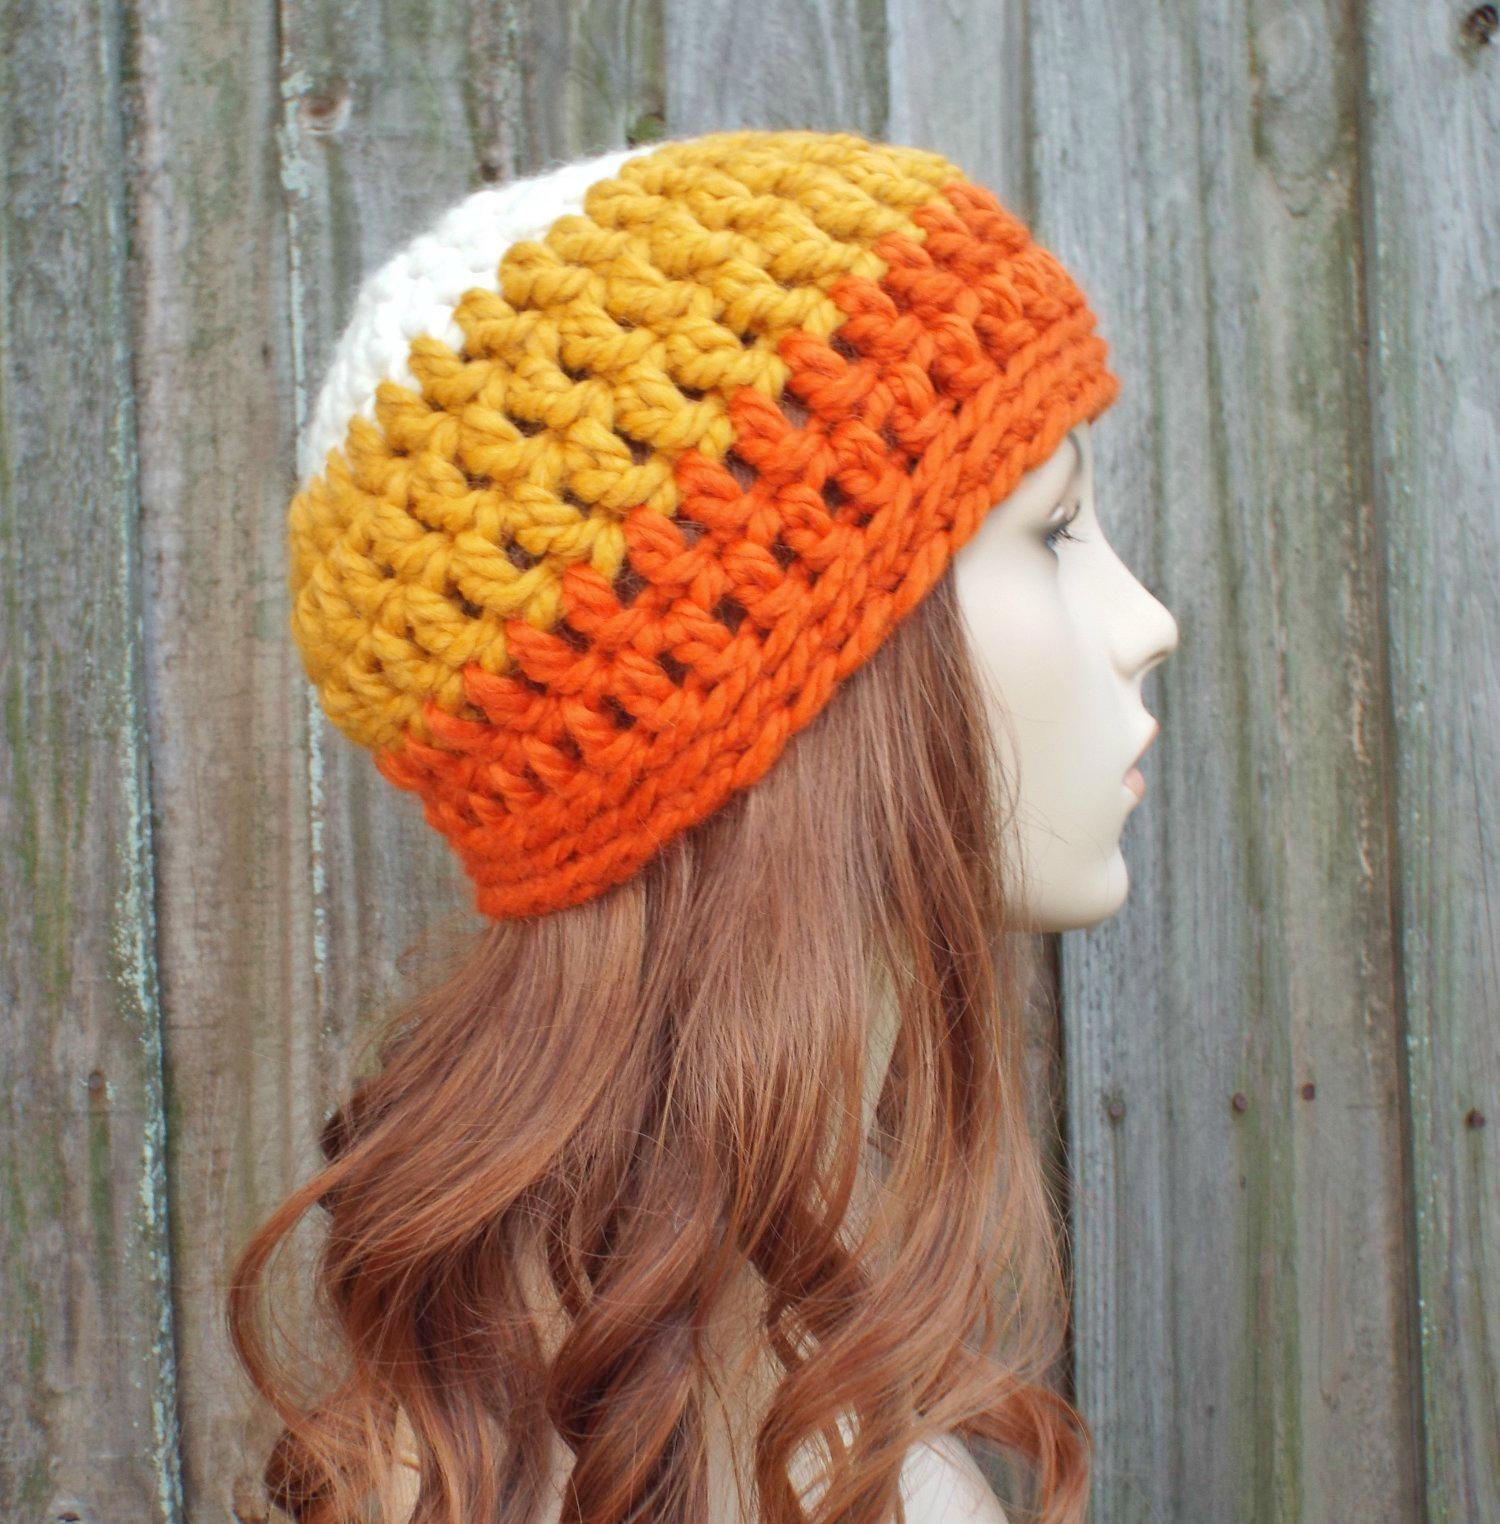 572c6081b2073 Candy Corn Beanie - Pumpkin Orange Mustard Yellow and Cream Beanie - Crochet  Womens Hat Mens Hat - Warm Winter Hat - READY TO SHIP